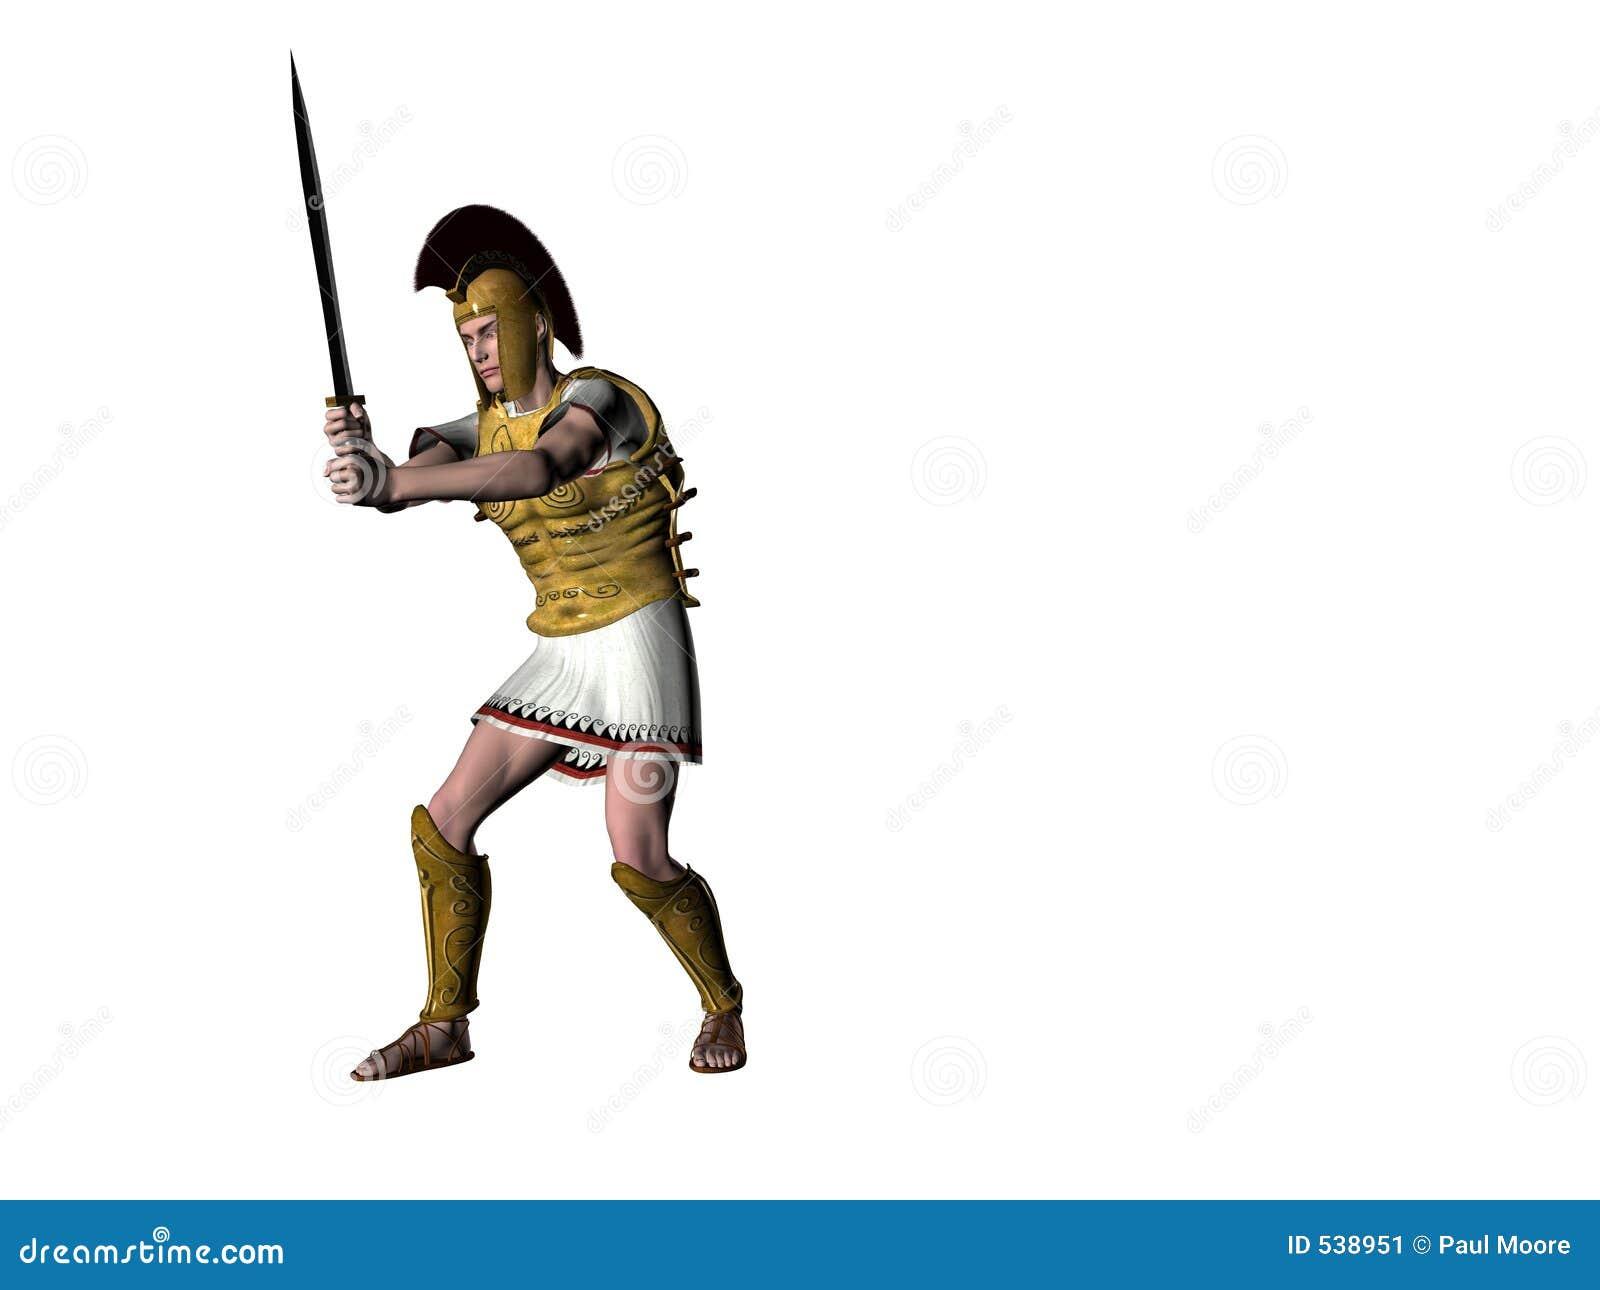 Download 10希腊战士 库存例证. 插画 包括有 回报, 伪造, 卷入持久战, 欧洲, 强大, 纹章, 保护, 翻译, 历史记录 - 538951